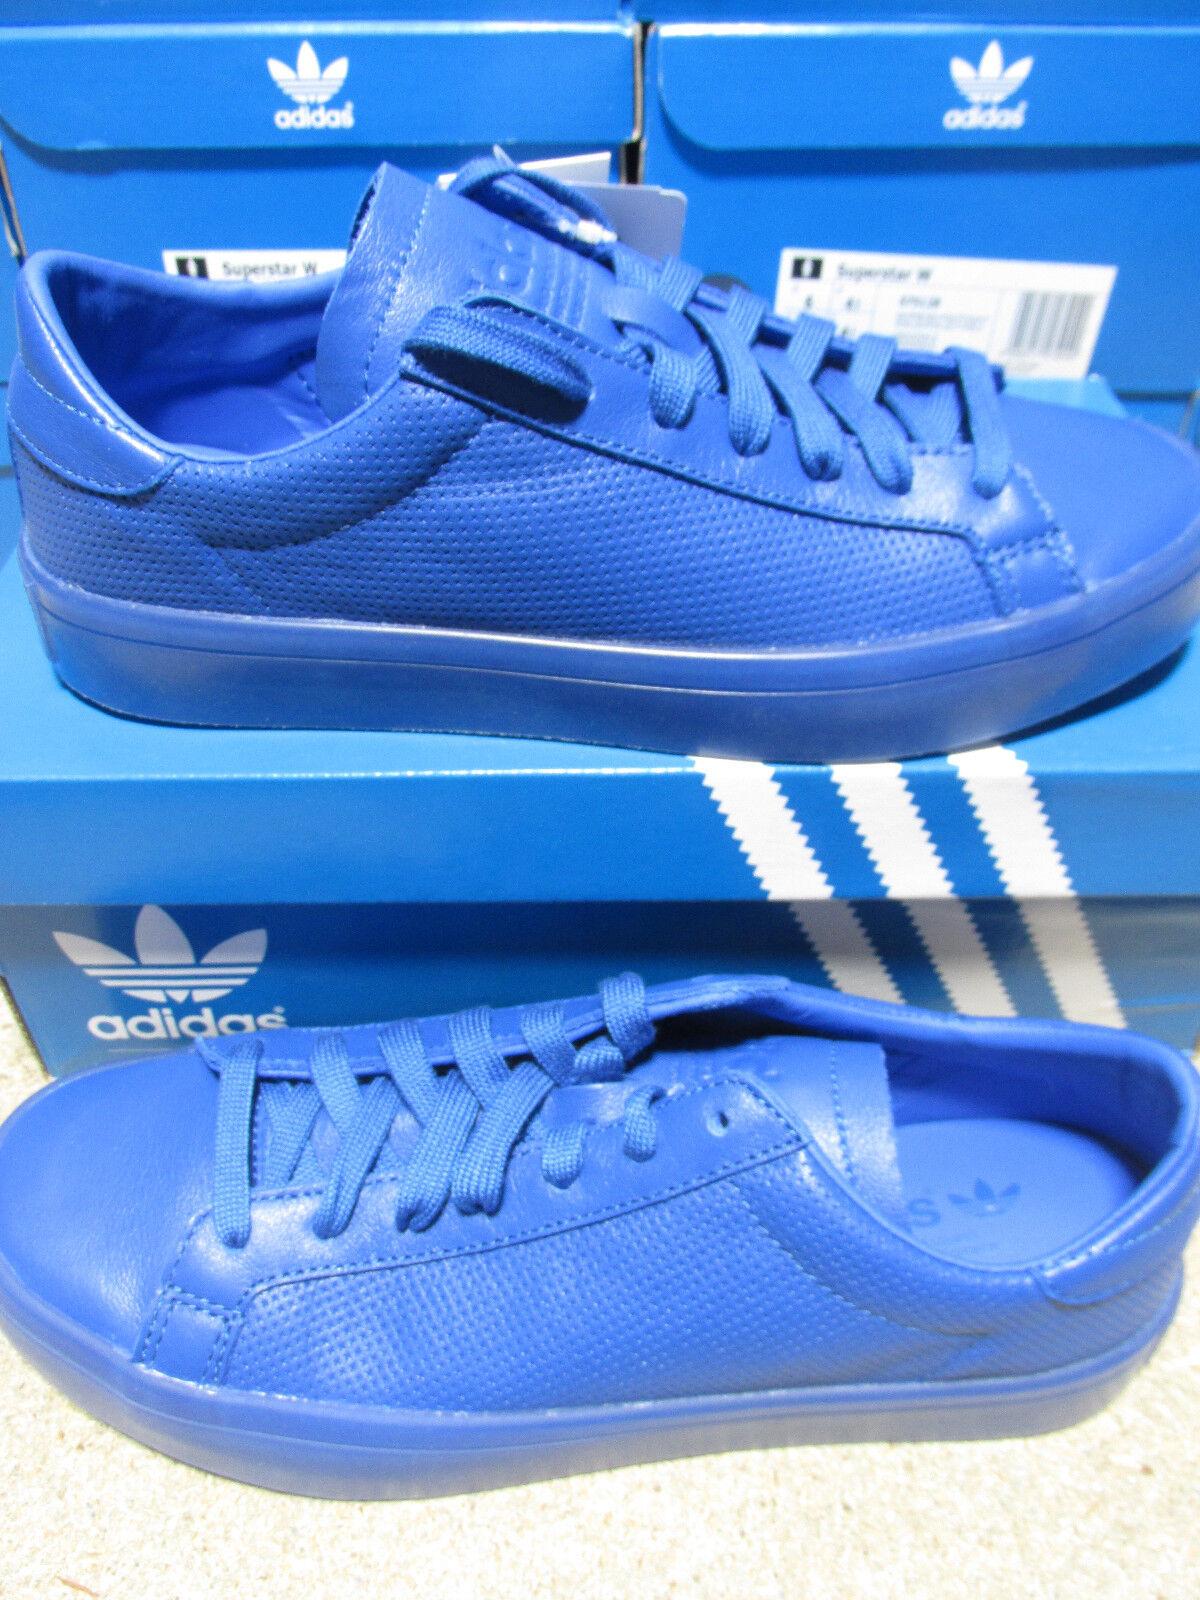 Adidas originals CourtVantage ADICOLOR mens S80252 Trainers Sneakers